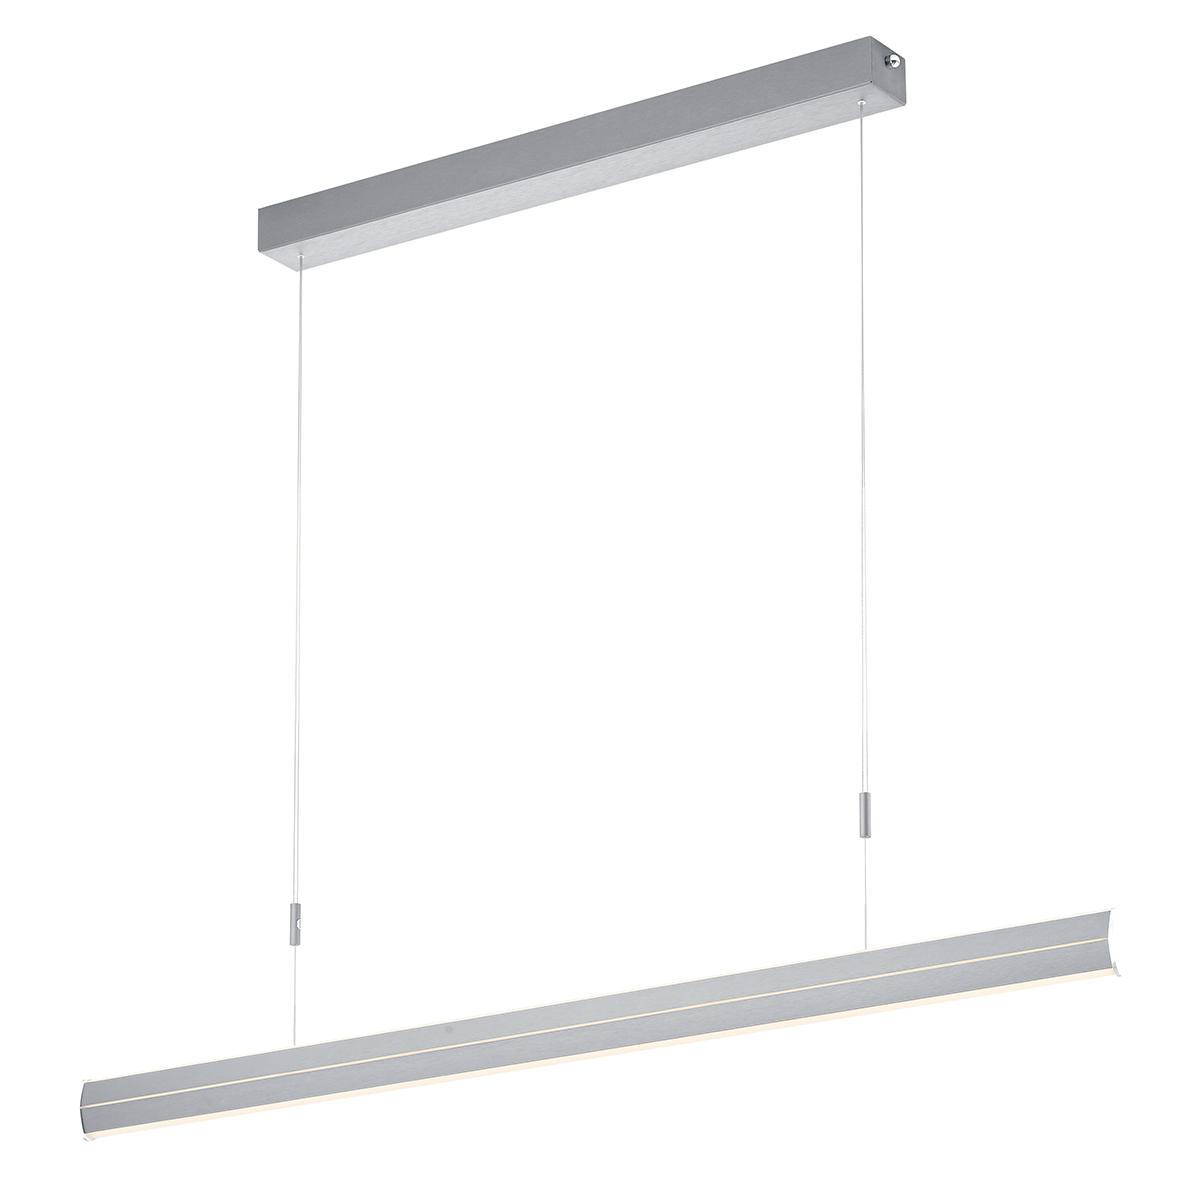 Bankamp Pure F LED Pendelleuchte 2193/1-92